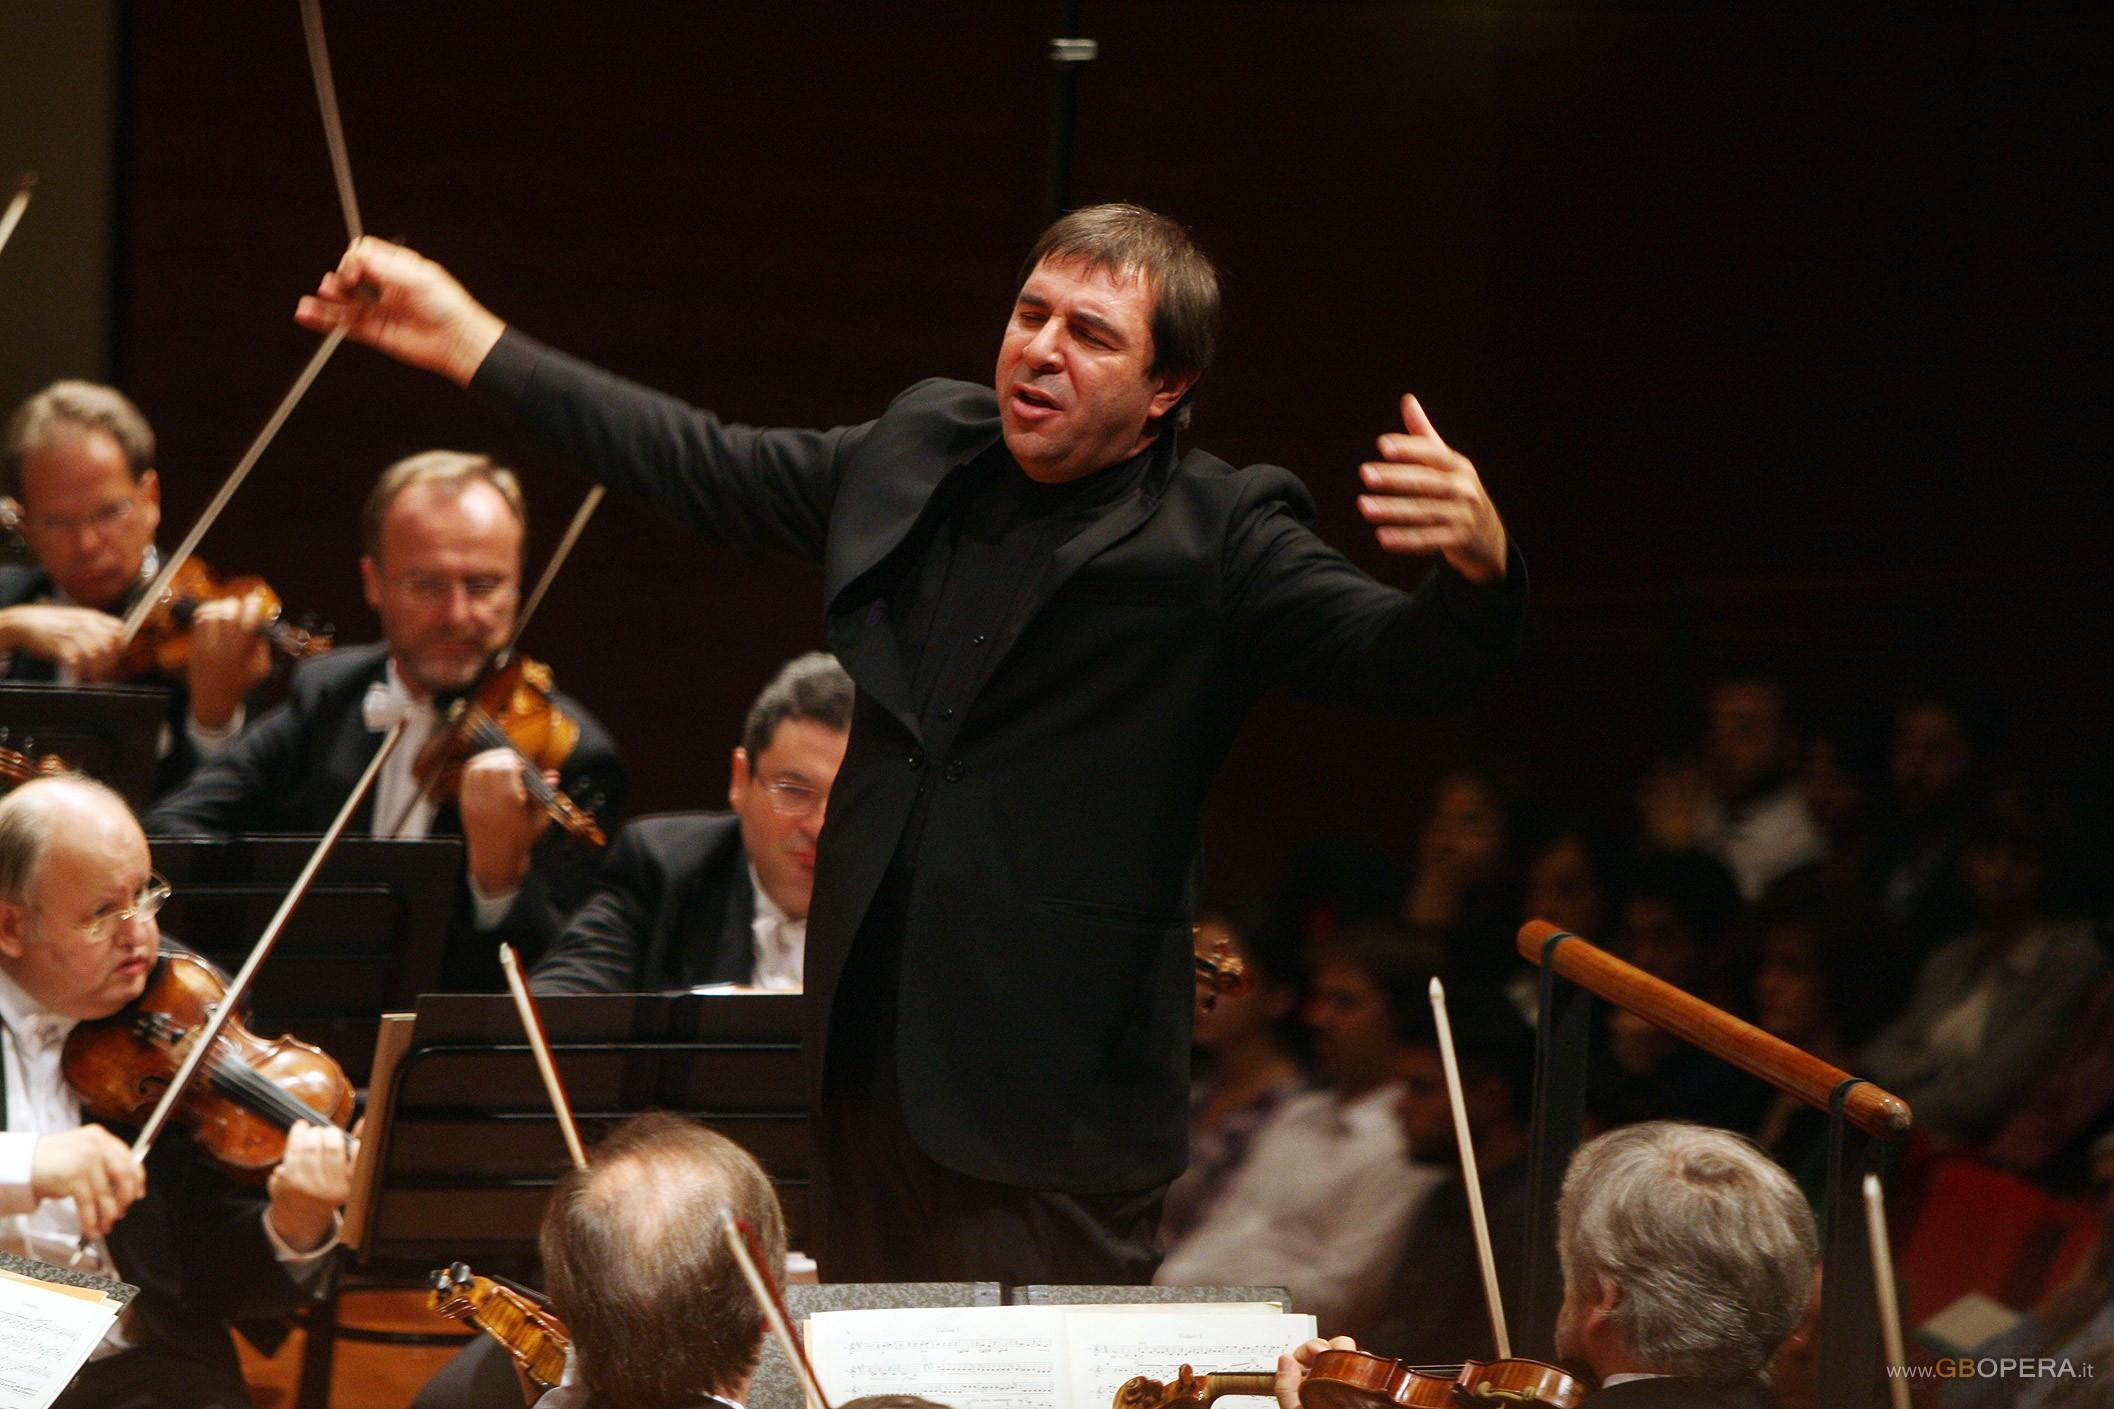 Tutte le sinfonie di Brahms a Torino con i Wiener Philarmoniker